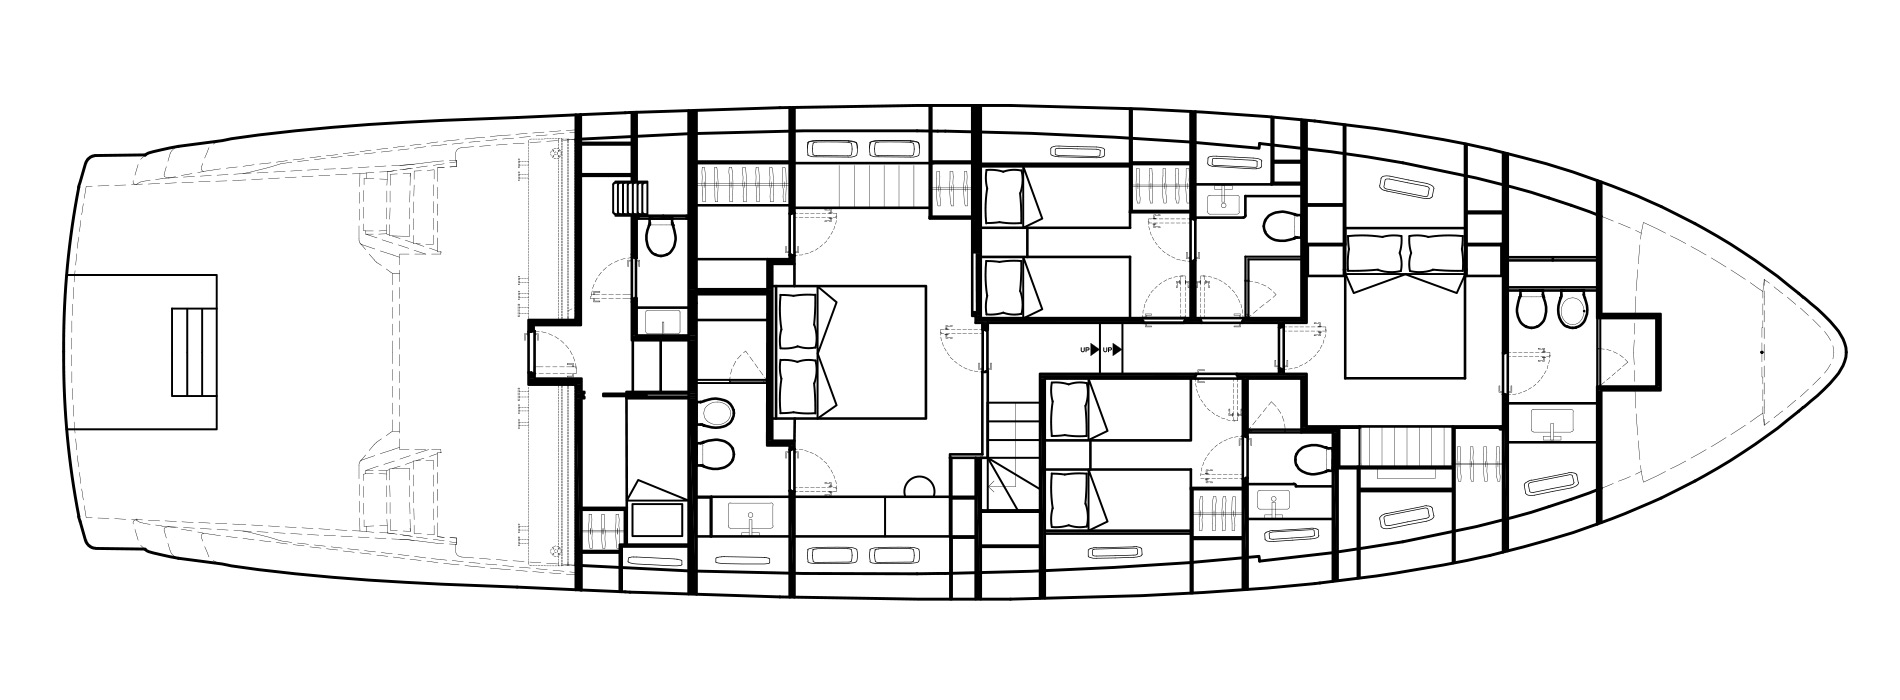 Sanlorenzo Yachts SX76 Lower Deck Versione A